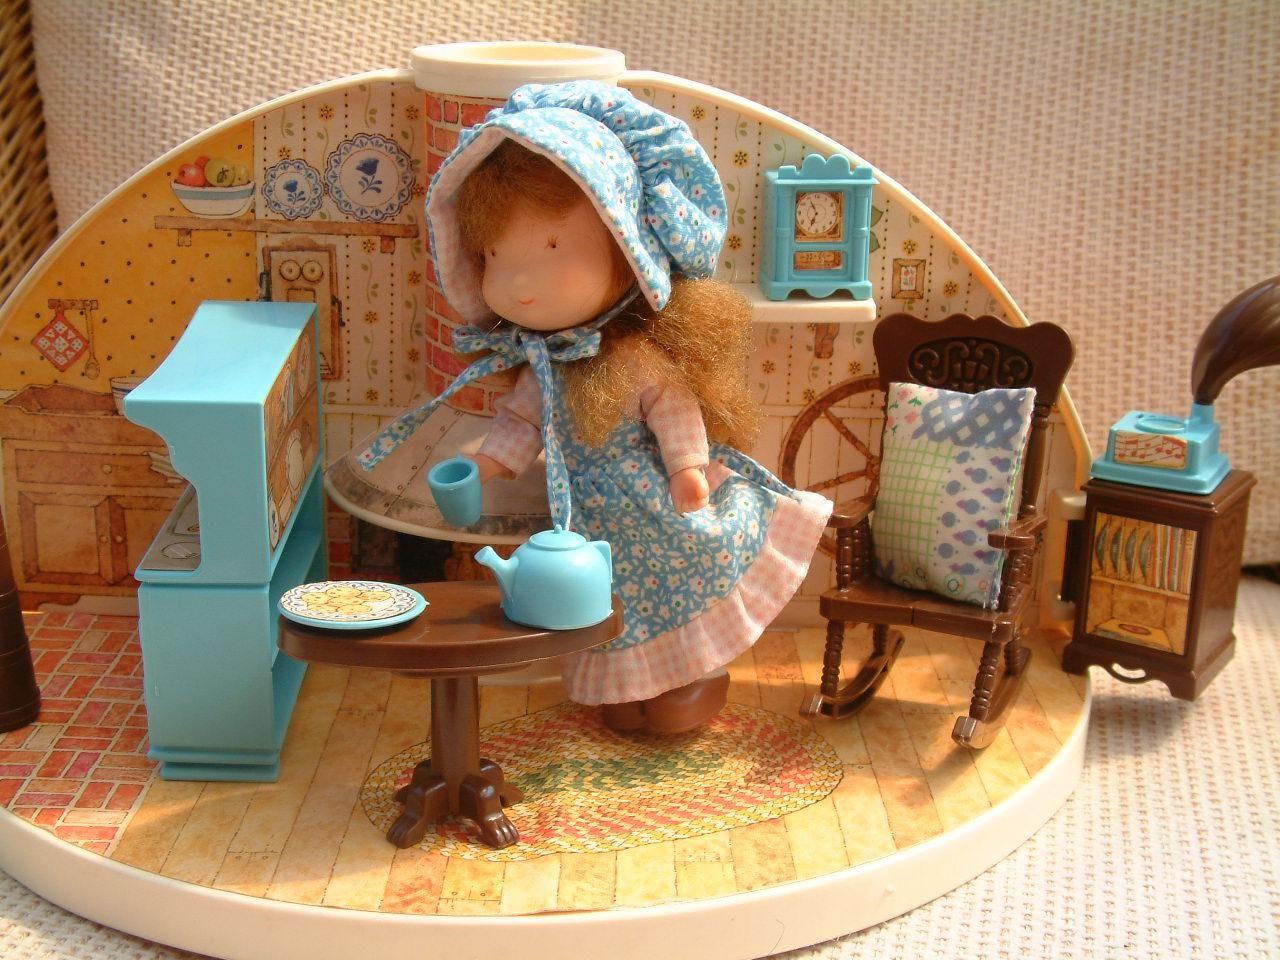 Holly hobbie dollhouse pesquisa google been there done that holly hobbie dollhouse pesquisa google reviewsmspy